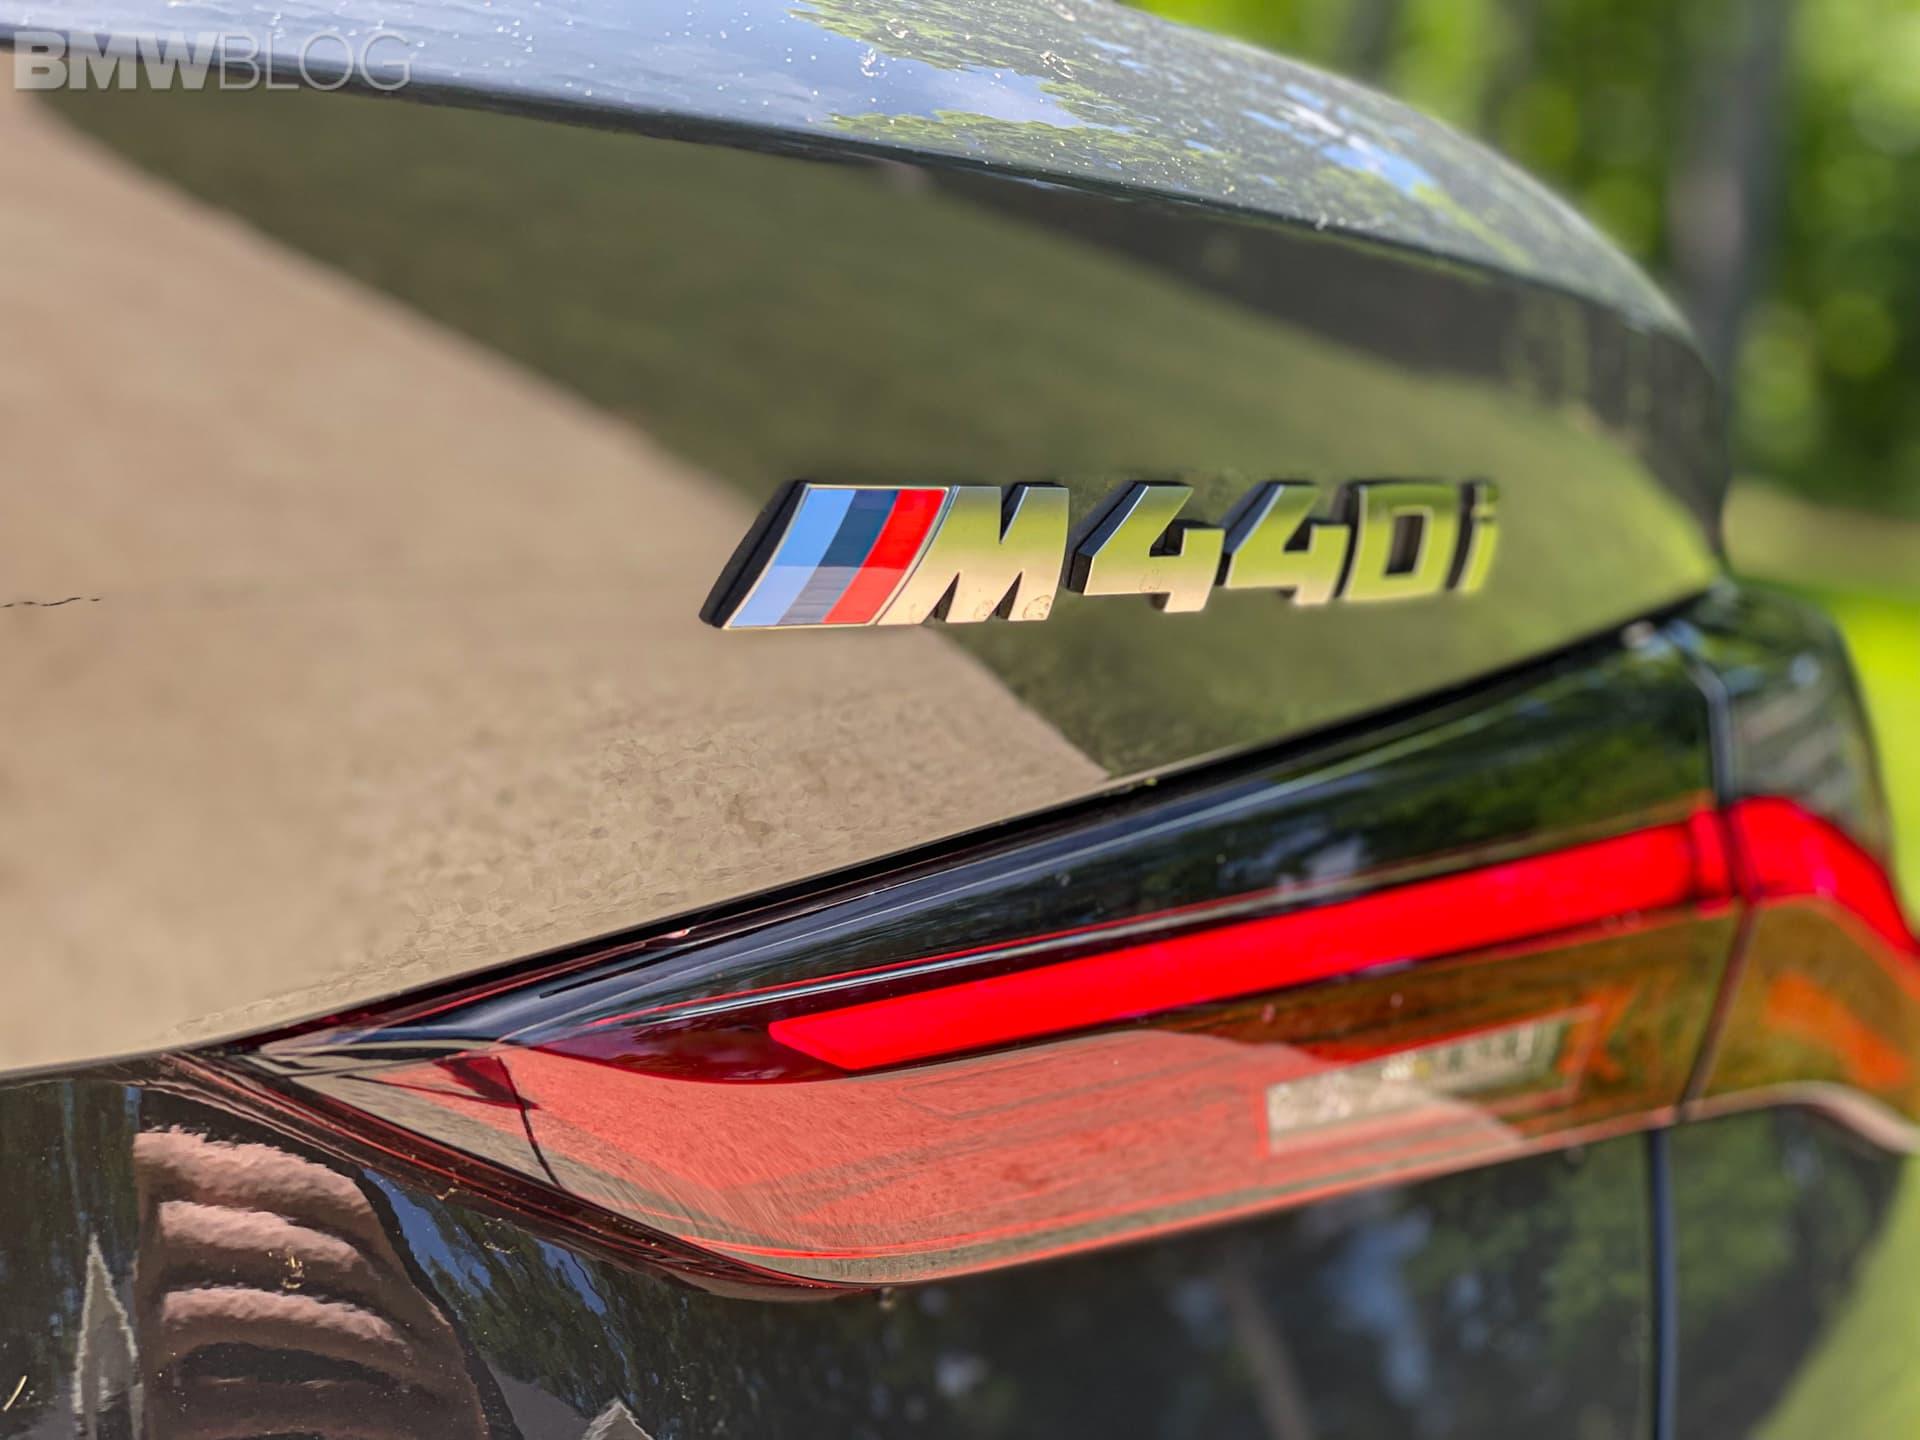 2021 bmw m440i convertible test drive 48